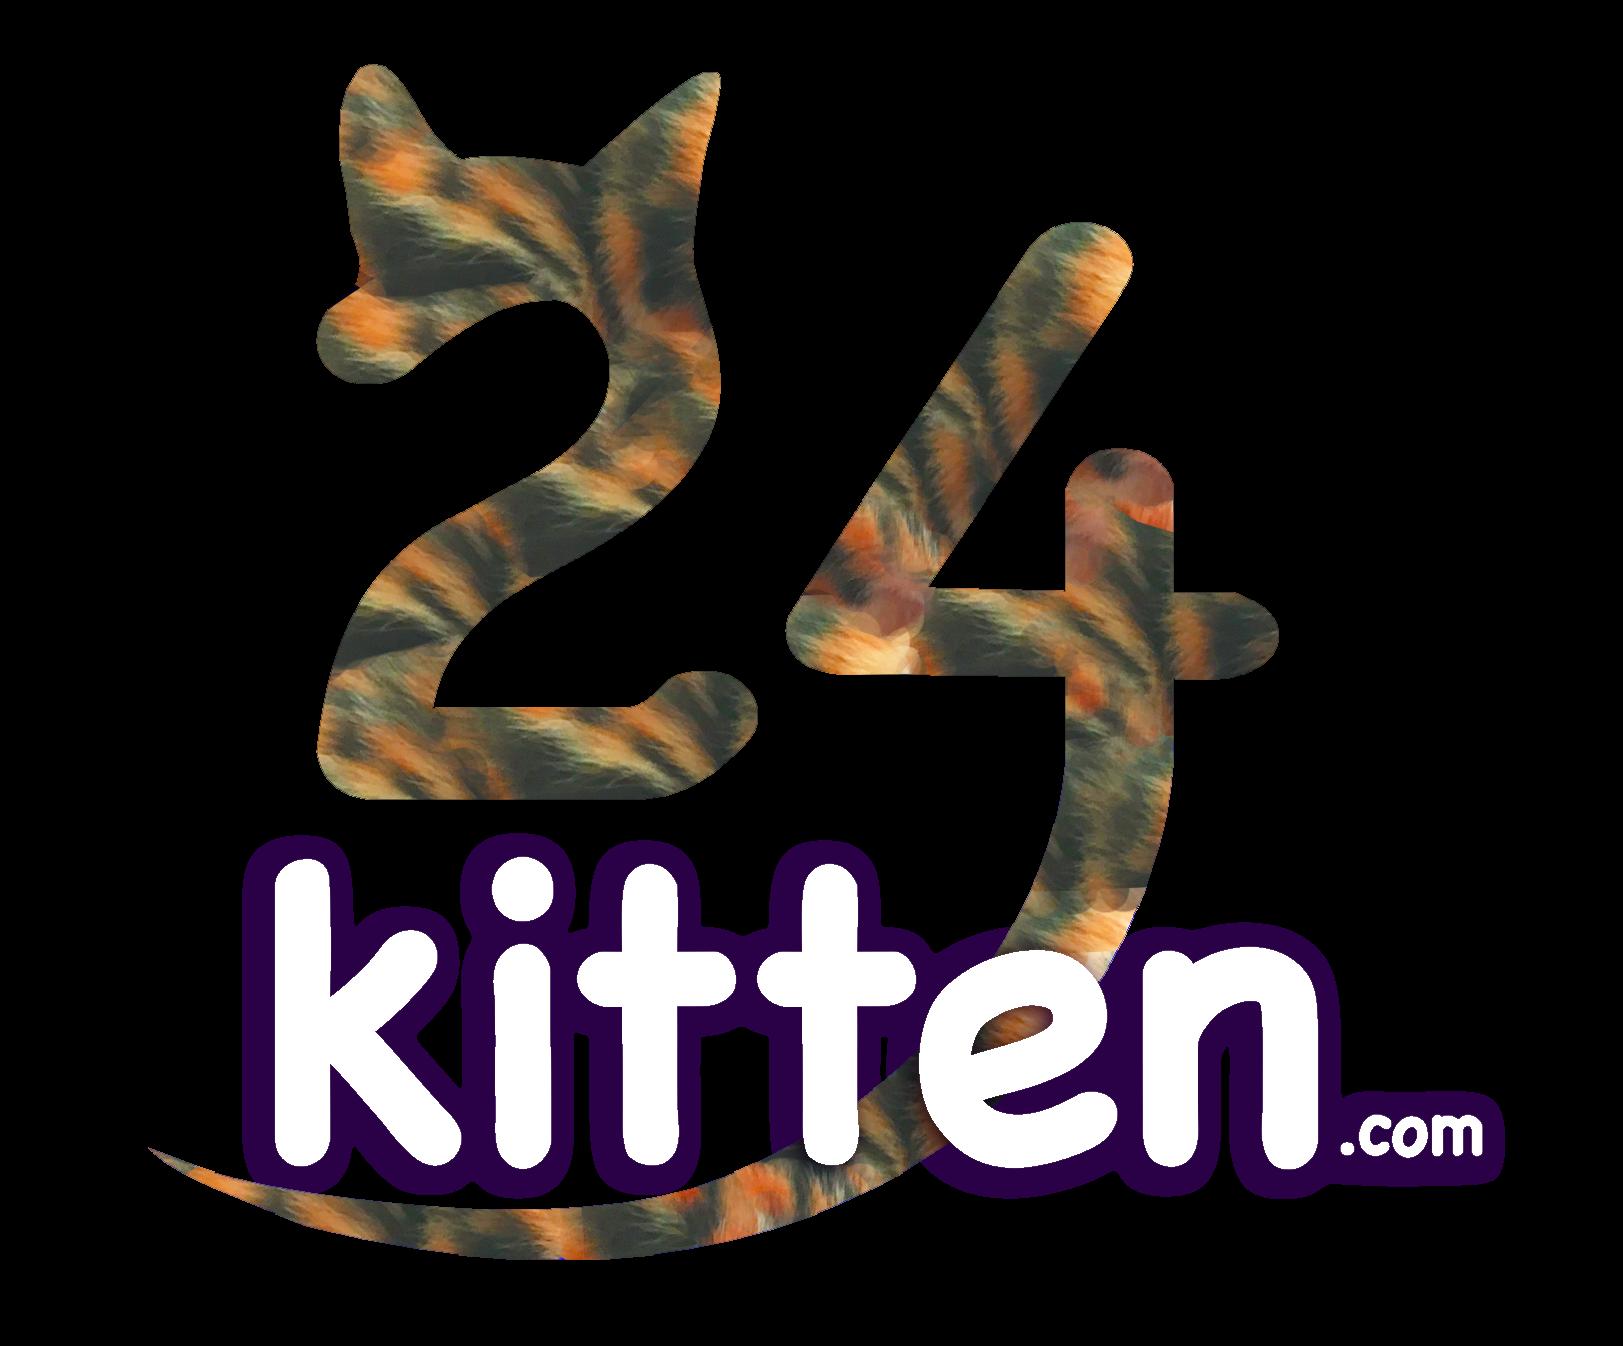 24kitten.com